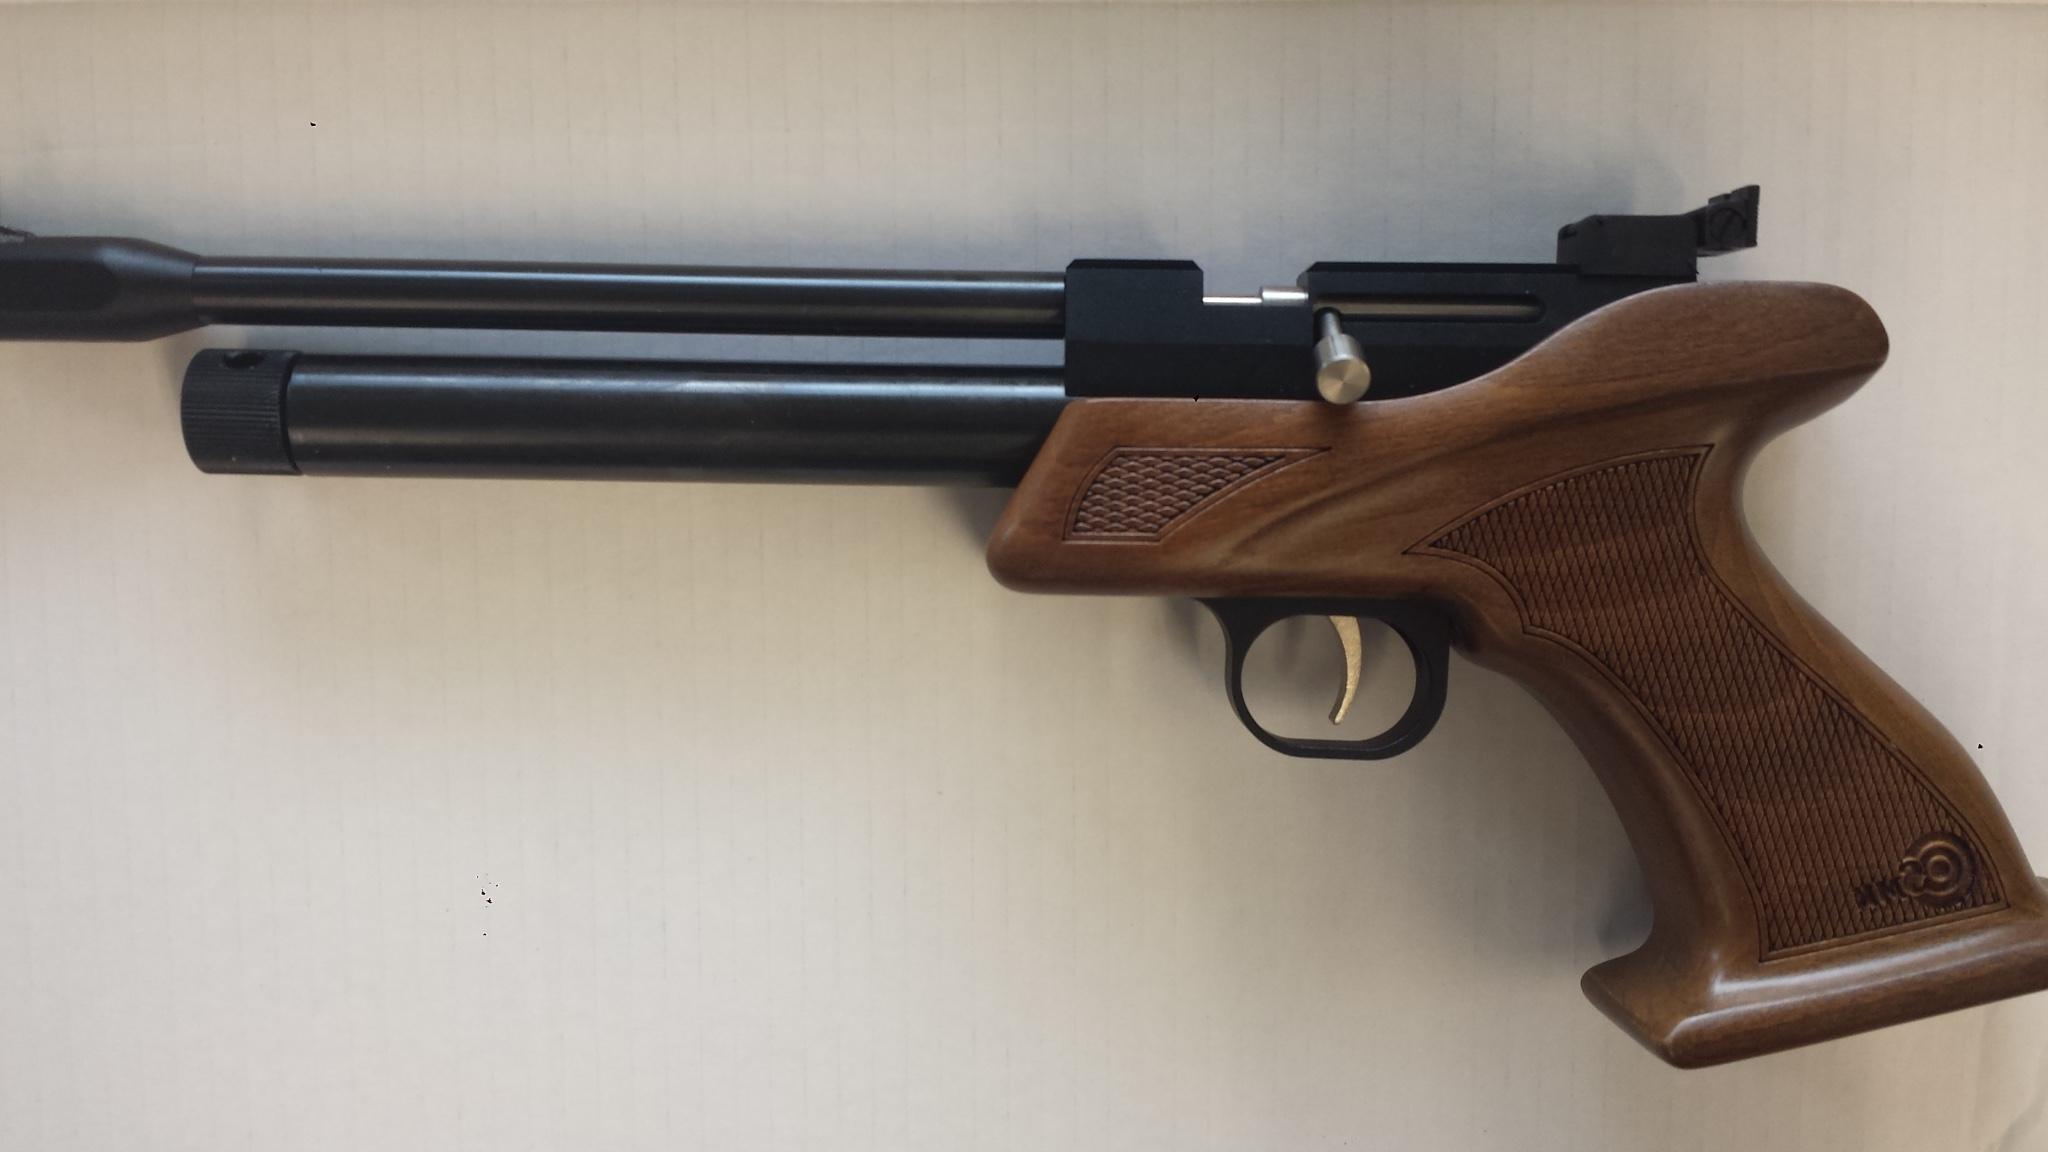 SMK CP1 Co pistol seal set of O ring: http://www.trrobb.com/SMK_CP1_Co_pistol_seal_set_of_O_ring/p1449438_17058295.aspx